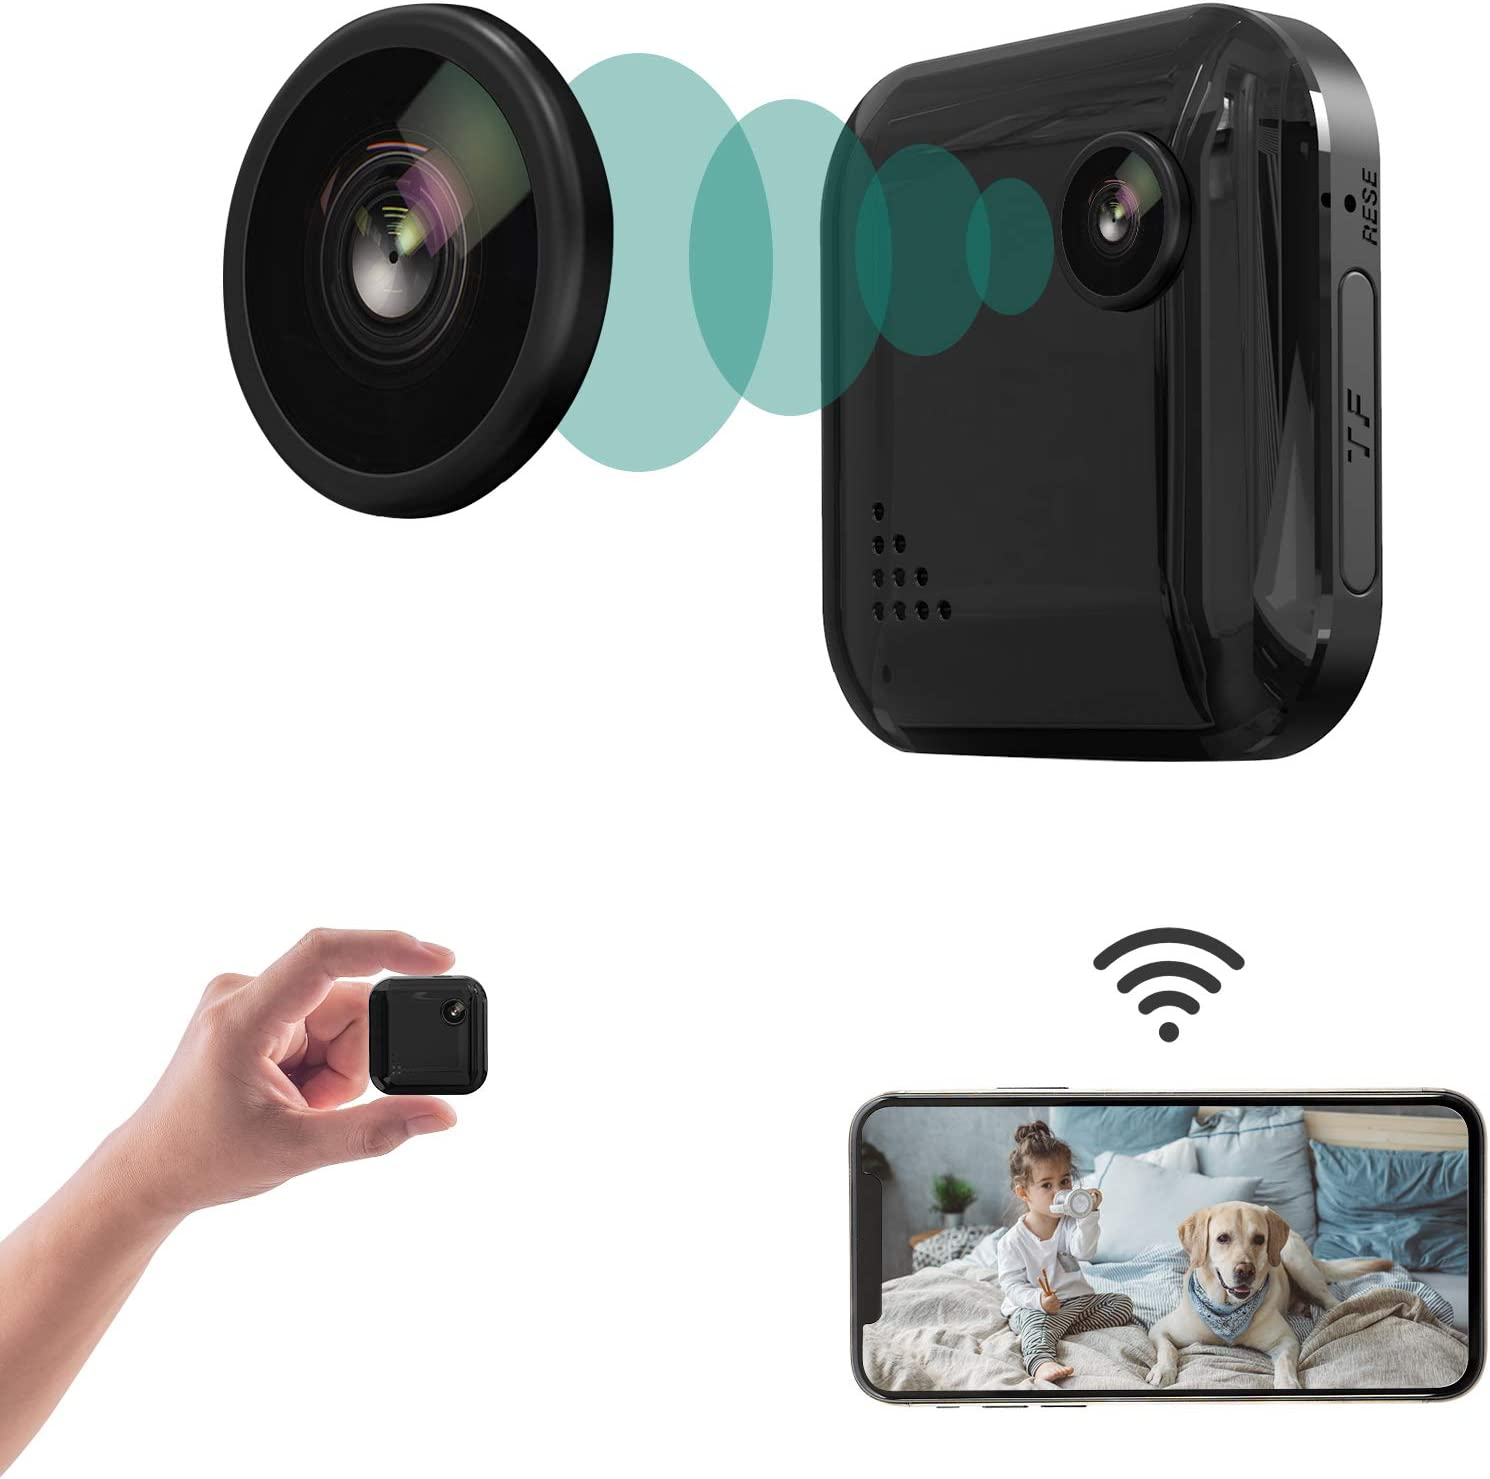 Spy Camera Mini Hidden Camera 1080P Wireless Spy Cam, Portable WiFi Nanny Cam with Night Vision, Motion Detection, Security Surveillance Cameras Audio & Video Recording for Live Remote View